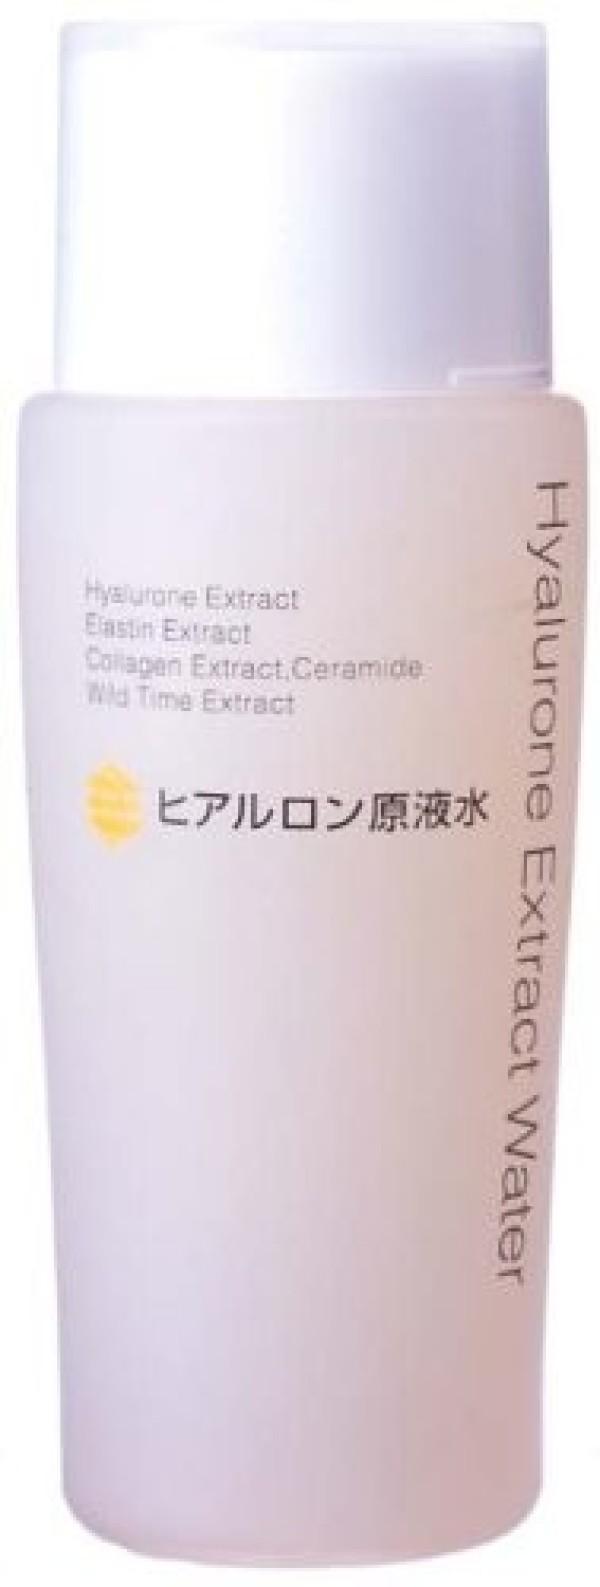 Гиалуроновая сыворотка - лосьон Hyalurone Extract Water BB Laboratories